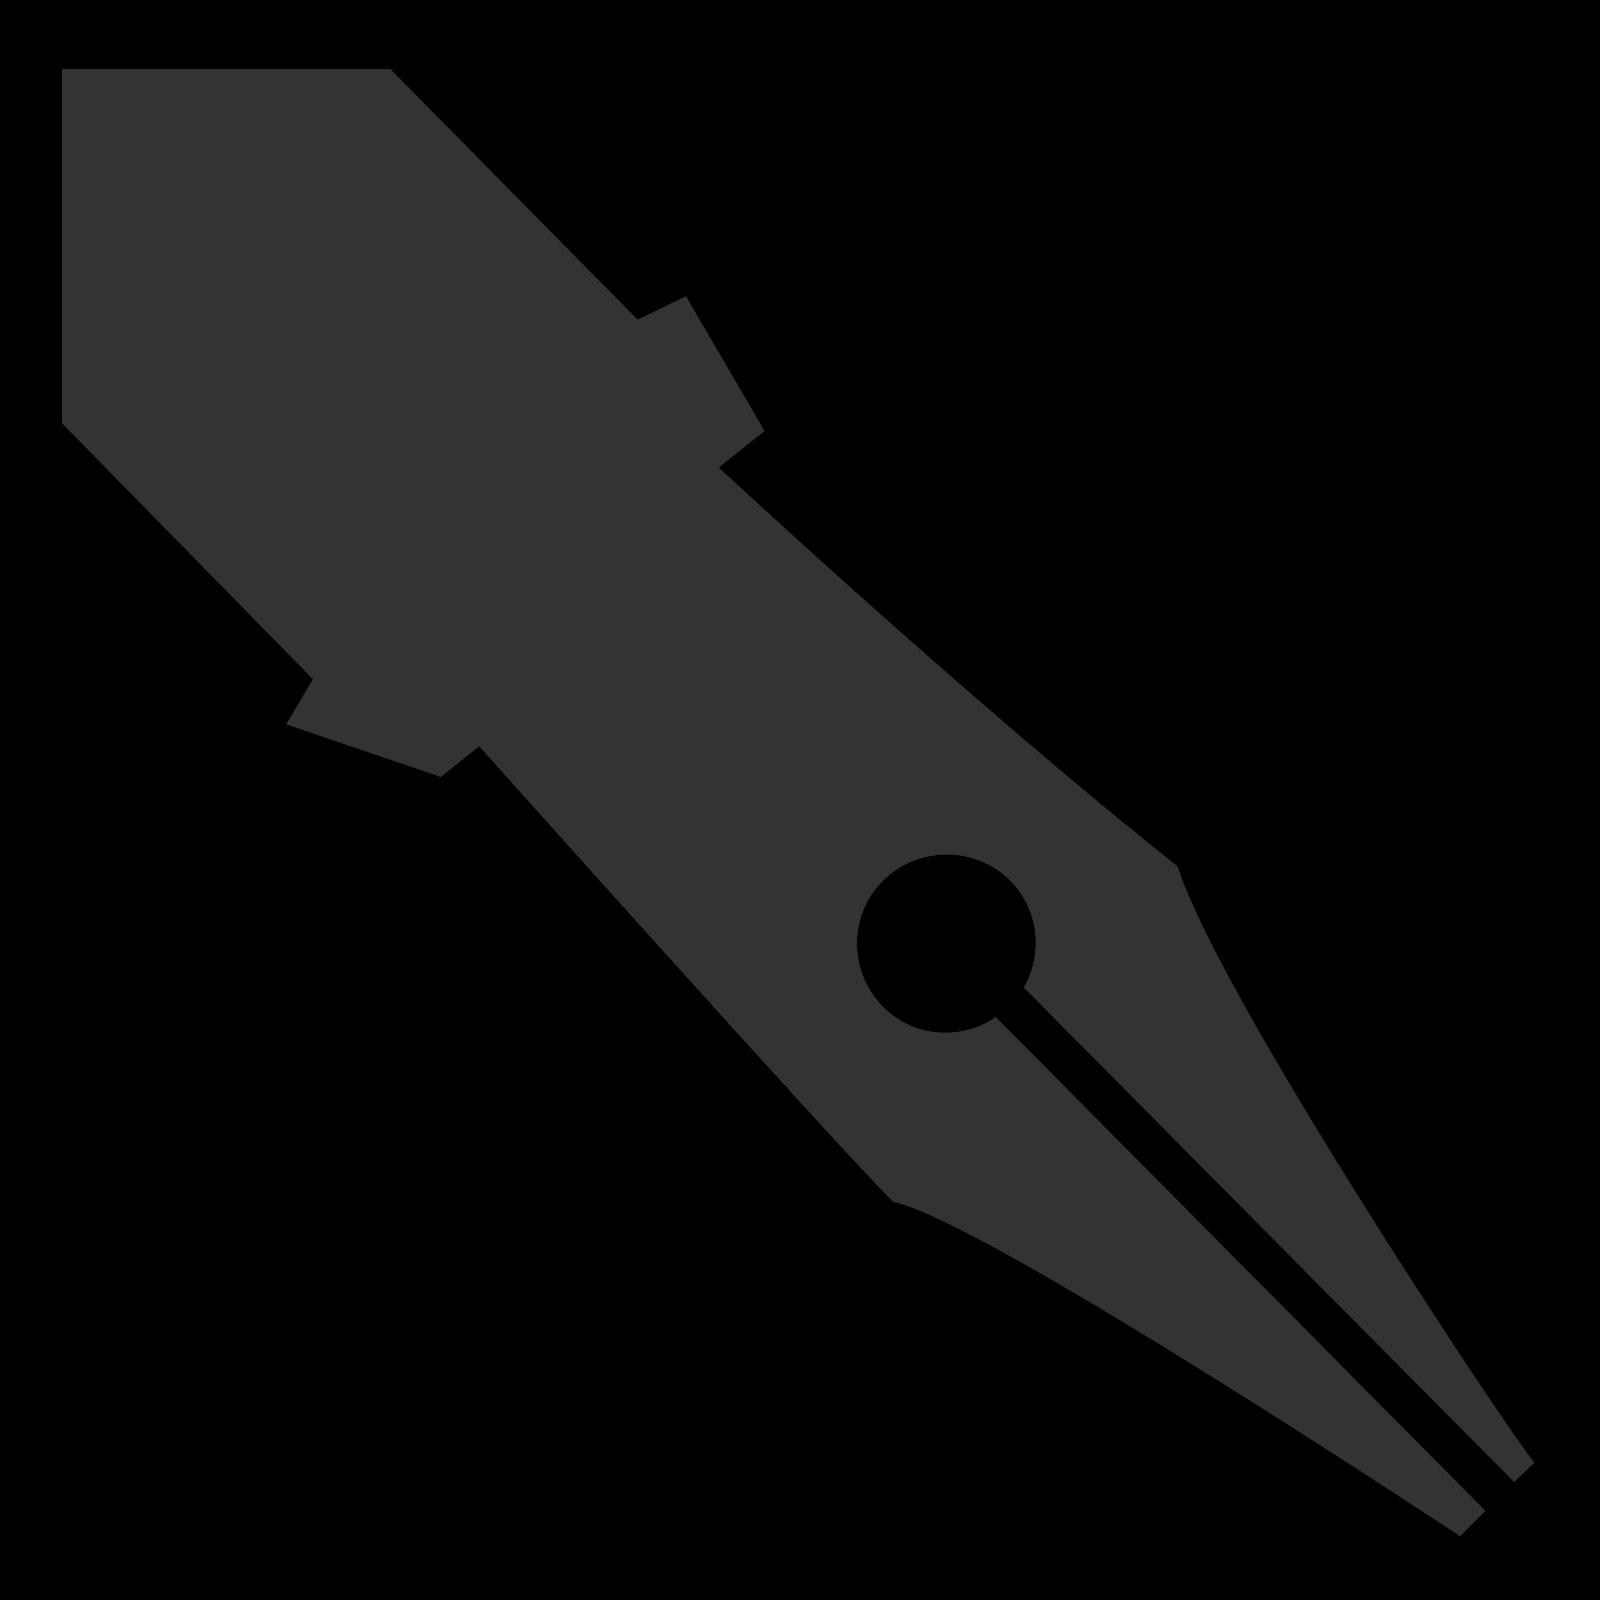 Tool Tip Clip Art at Clker.com - vector clip art online, royalty free &  public domain